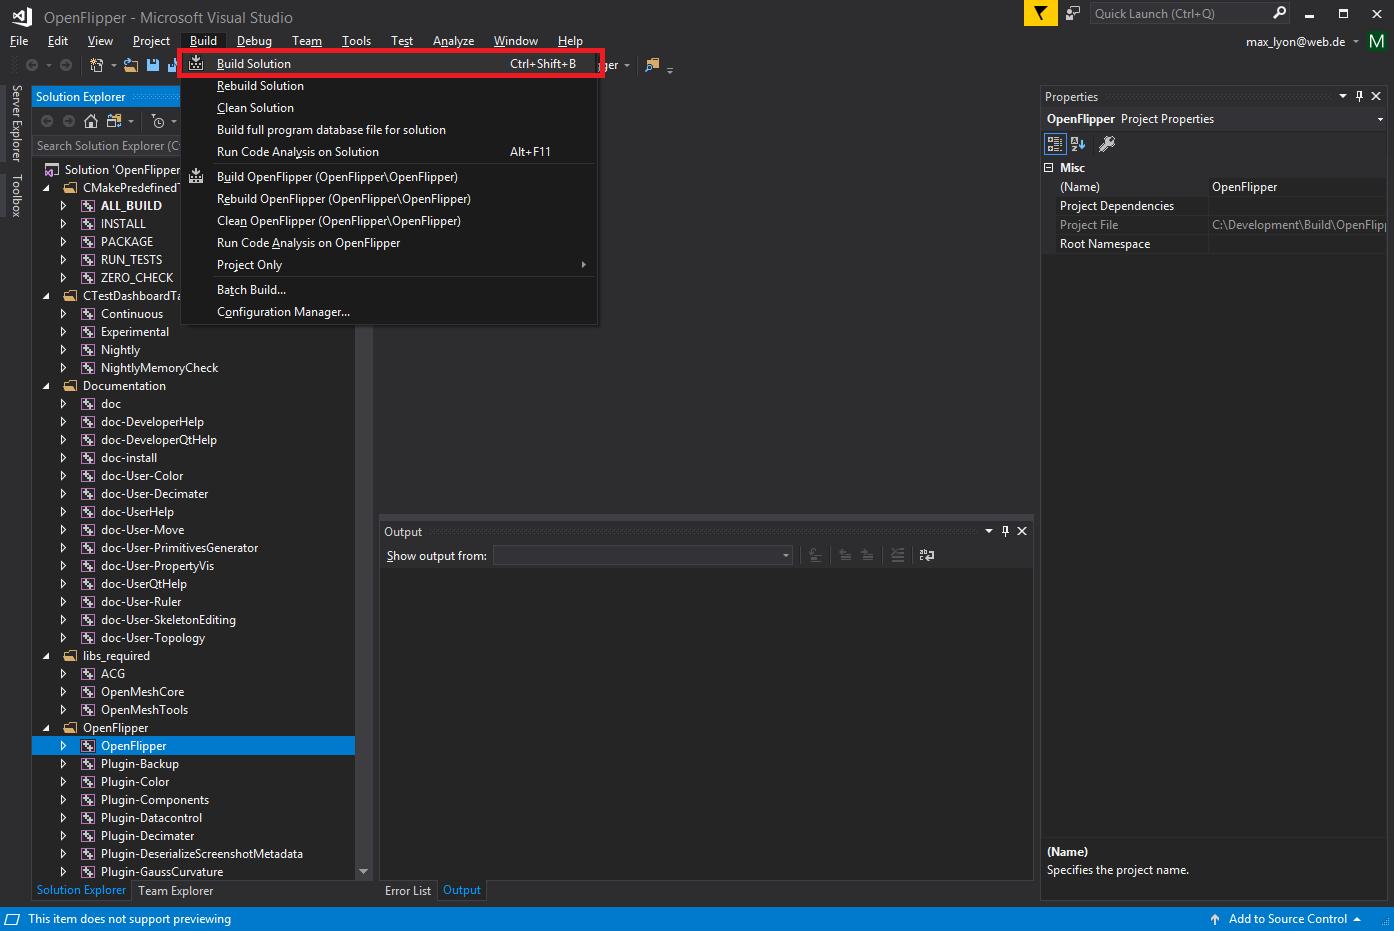 Documentation/DeveloperHelpSources/building-screenshots/16_build_solution.png